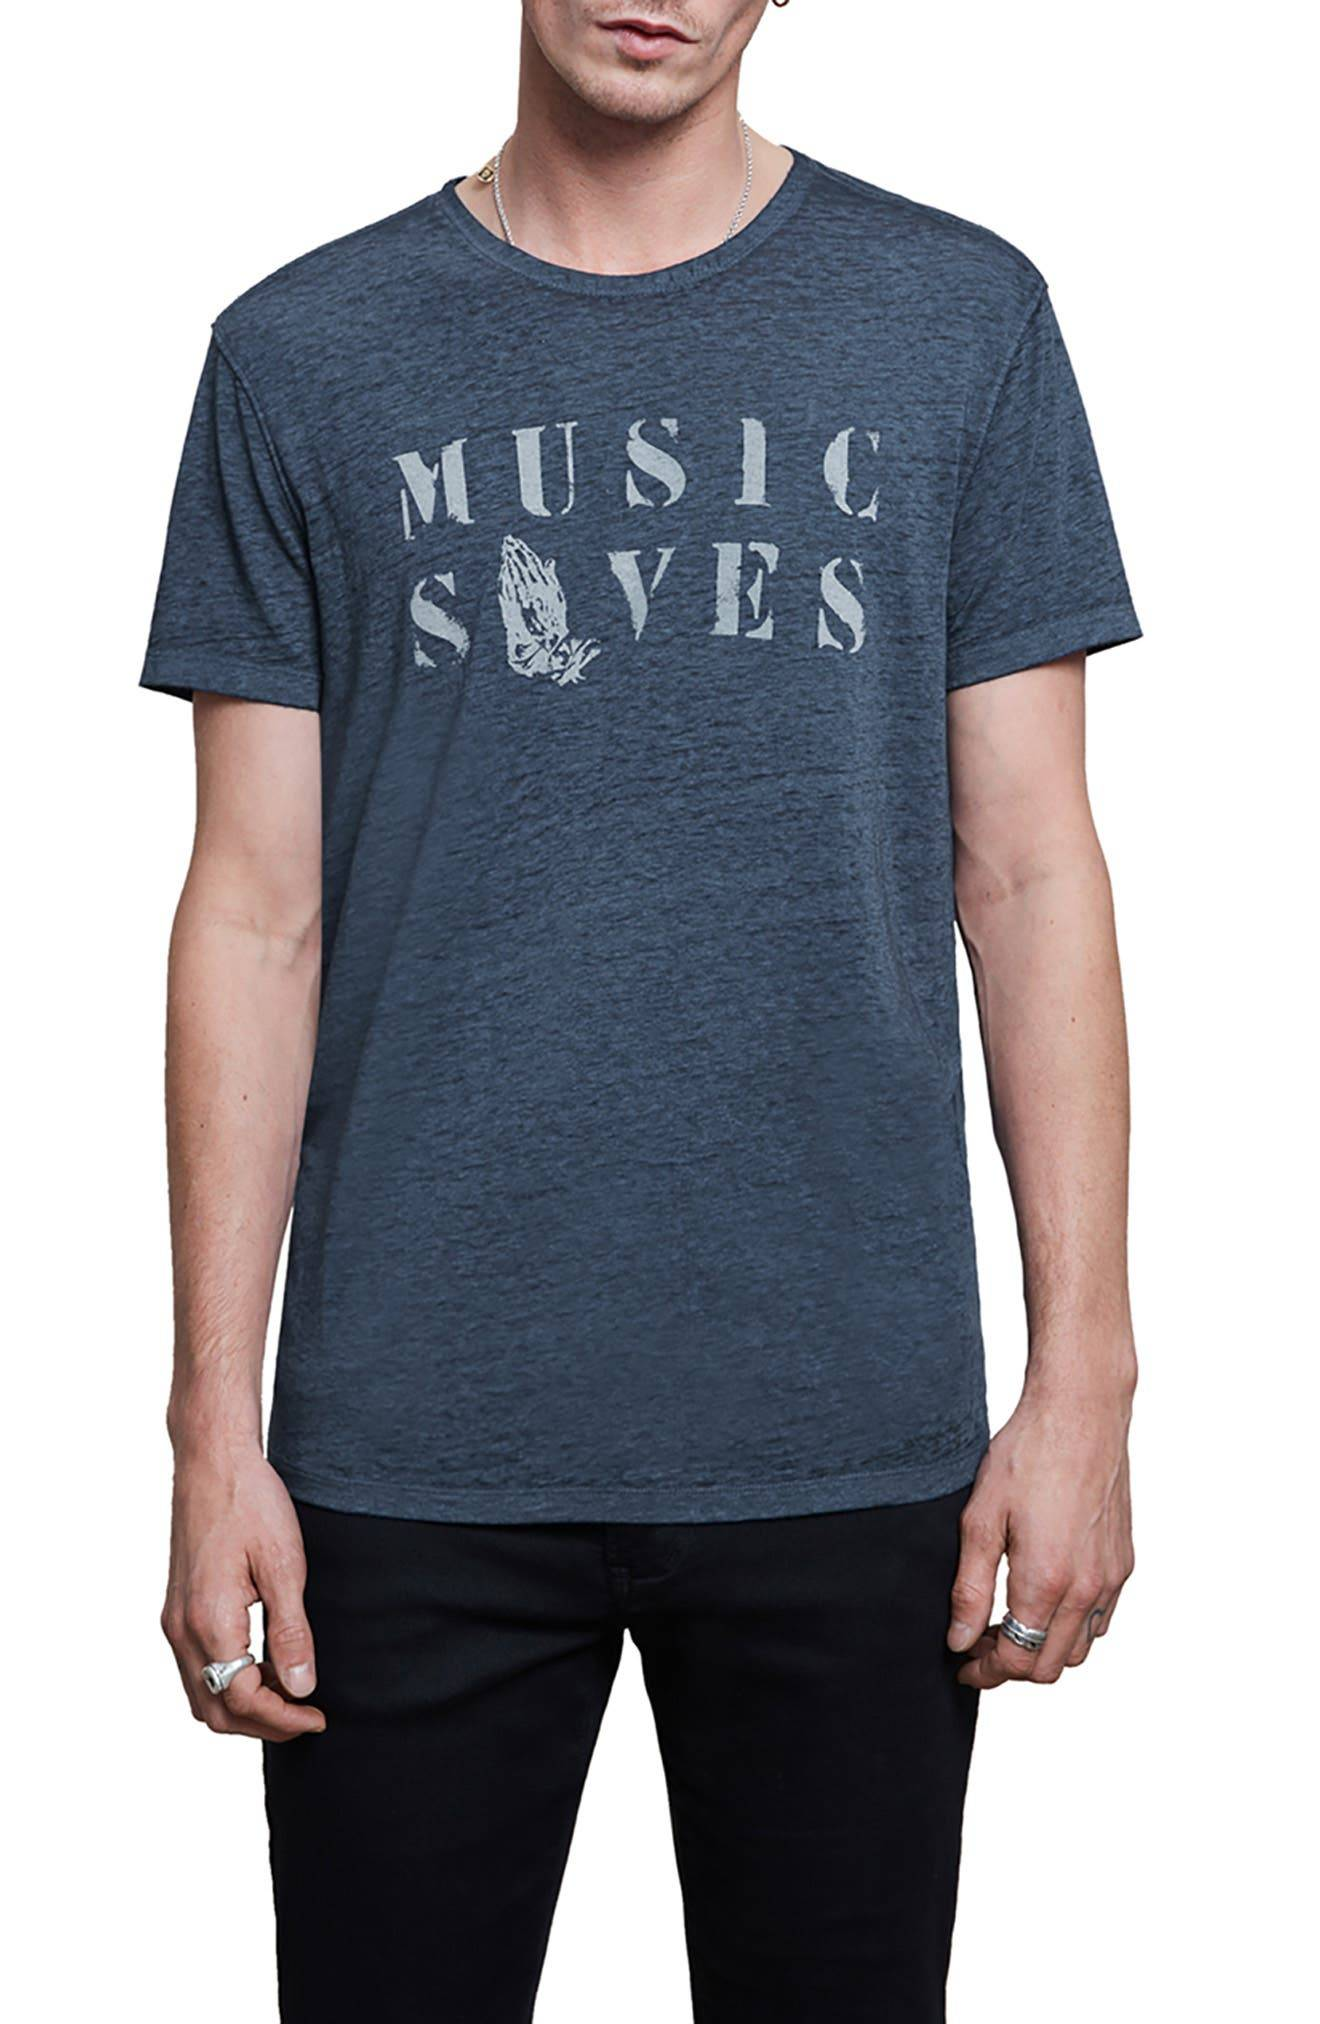 John Varvatos Men's John Varvatos Music Saves Graphic Tee, Size Medium - Blue